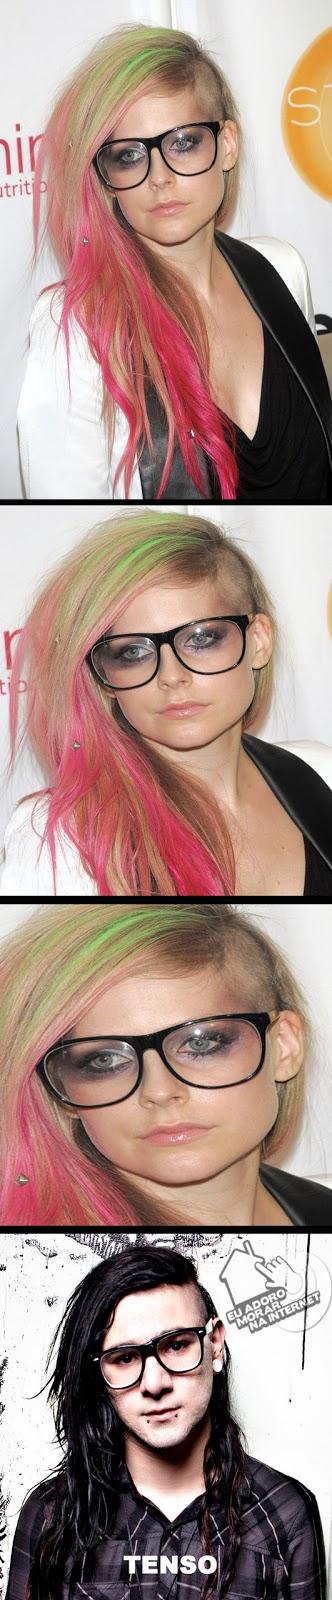 avril lavigne, skrillex, novo corte de cabelo da avril lavigne, tenso , imagens, humor, eu adoro morar na internet